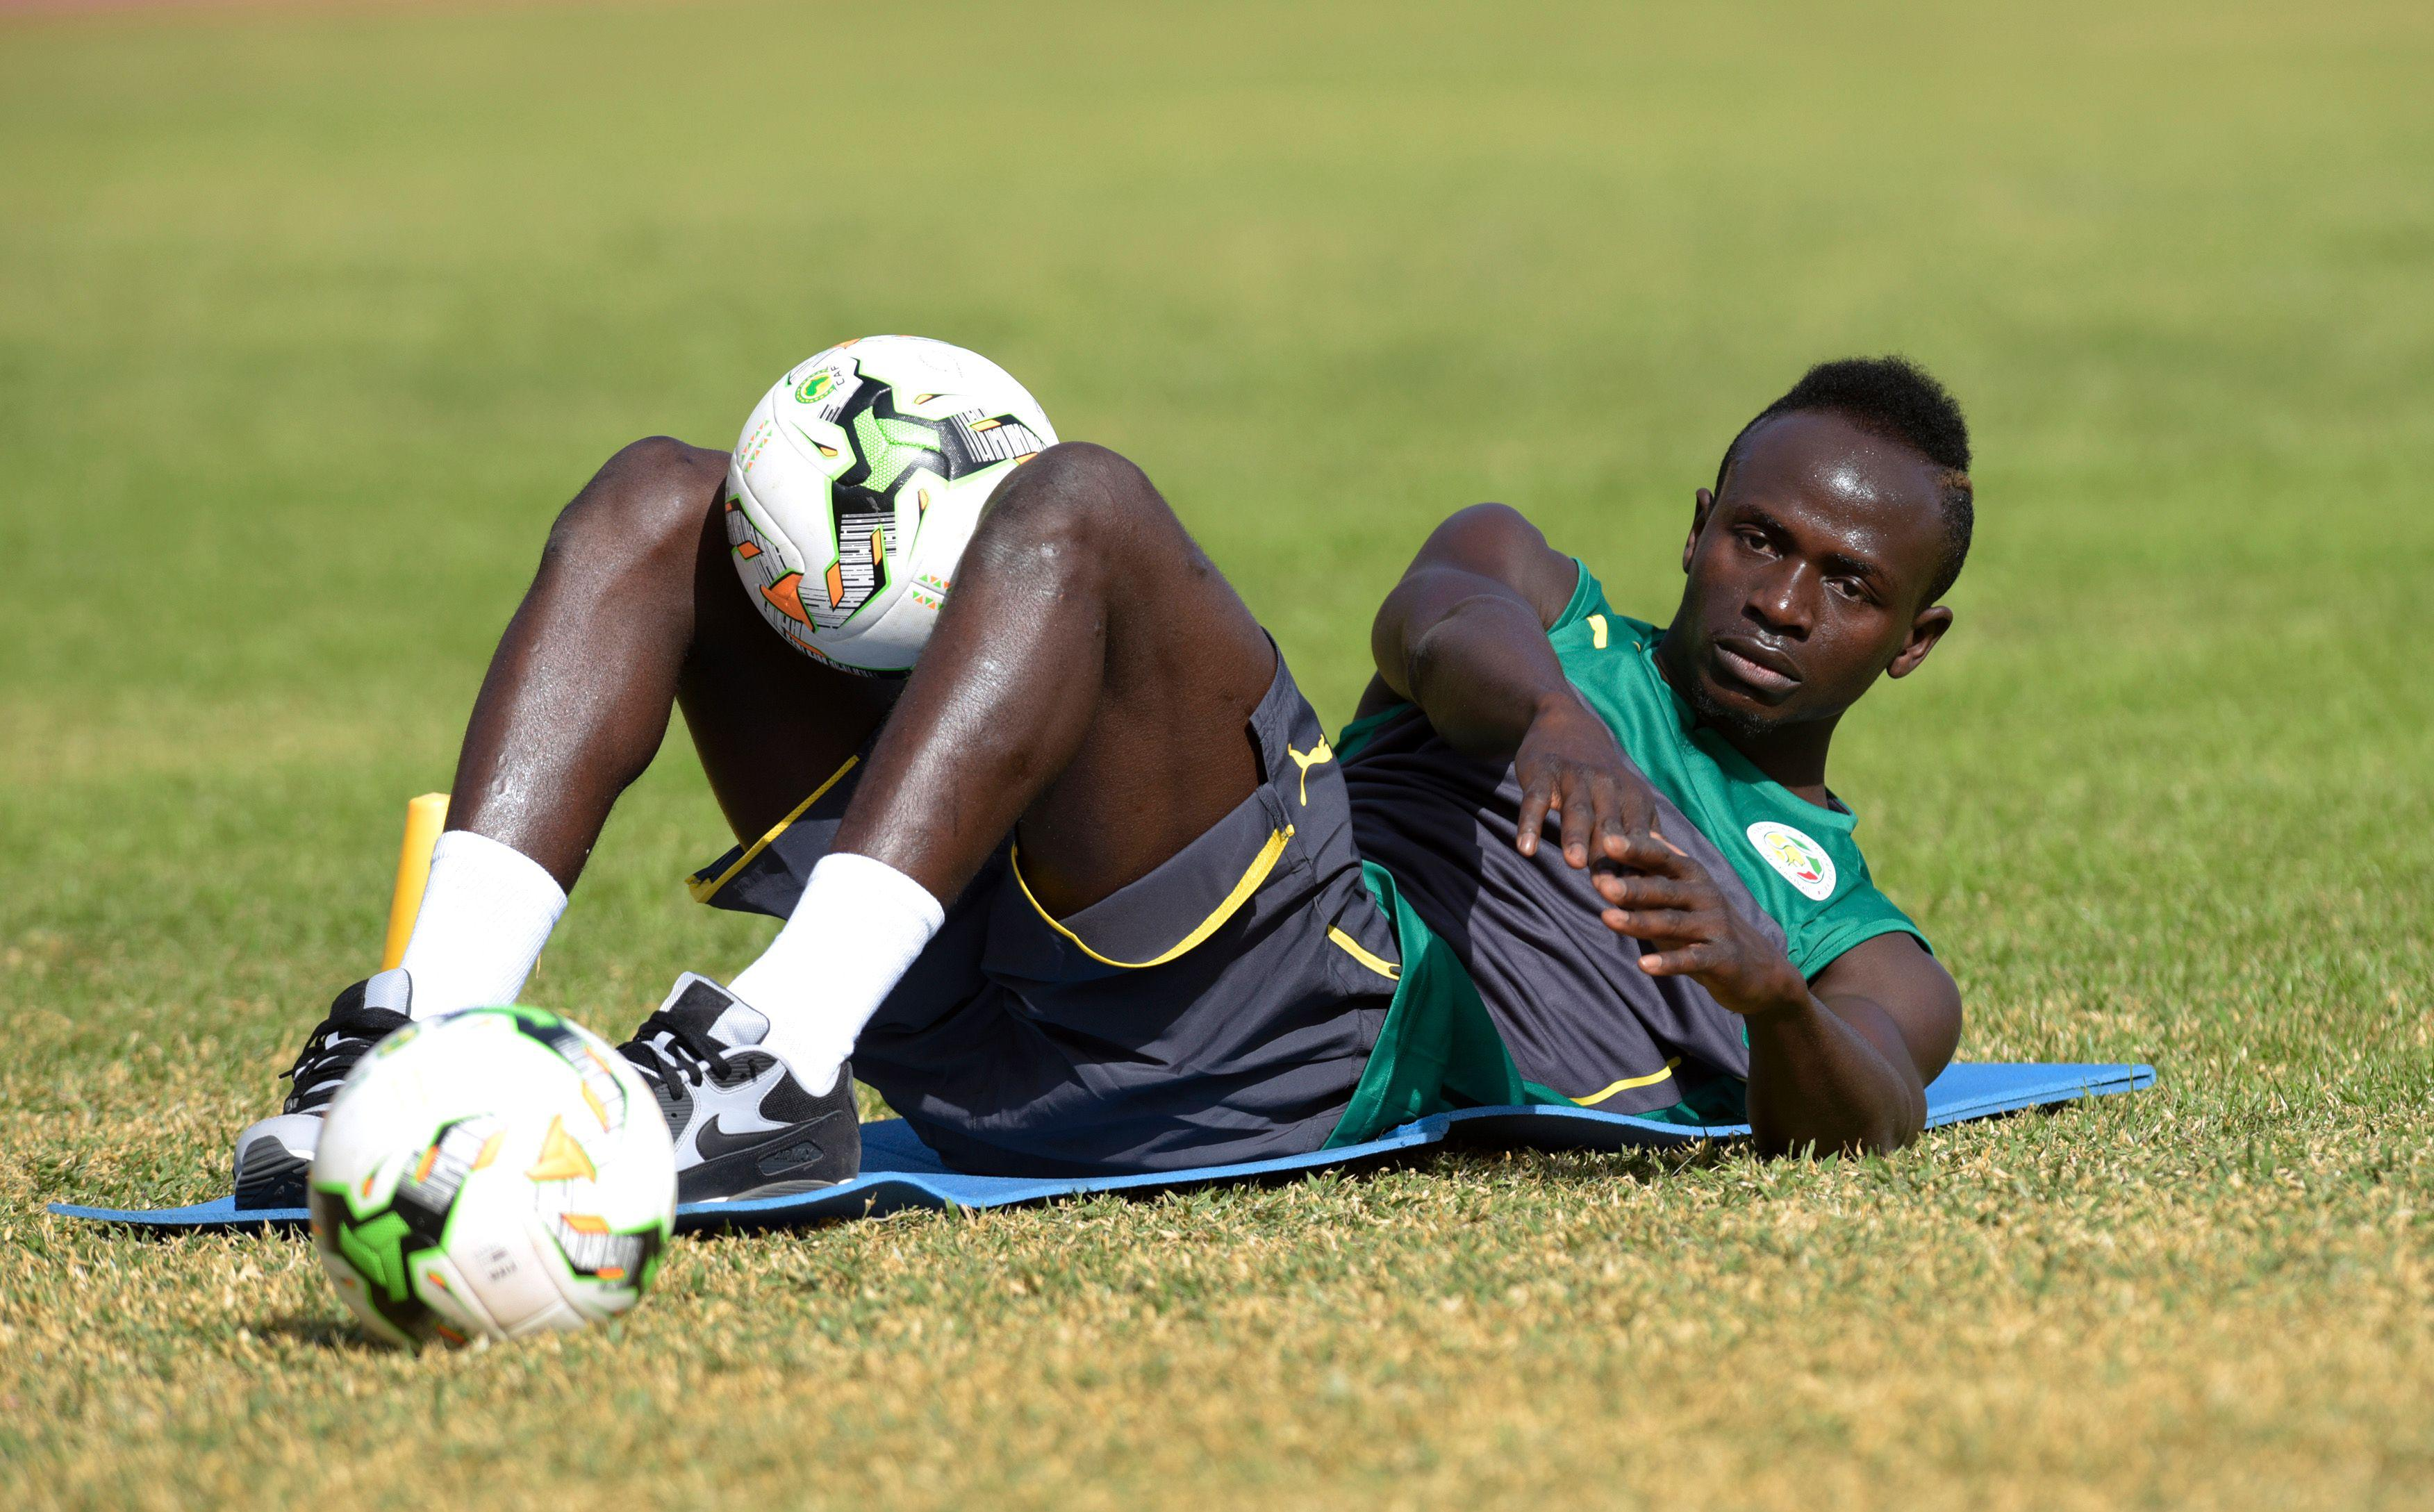 Sadio Mane joins training session at the Leopold Sedar Senghor stadium in Dakar